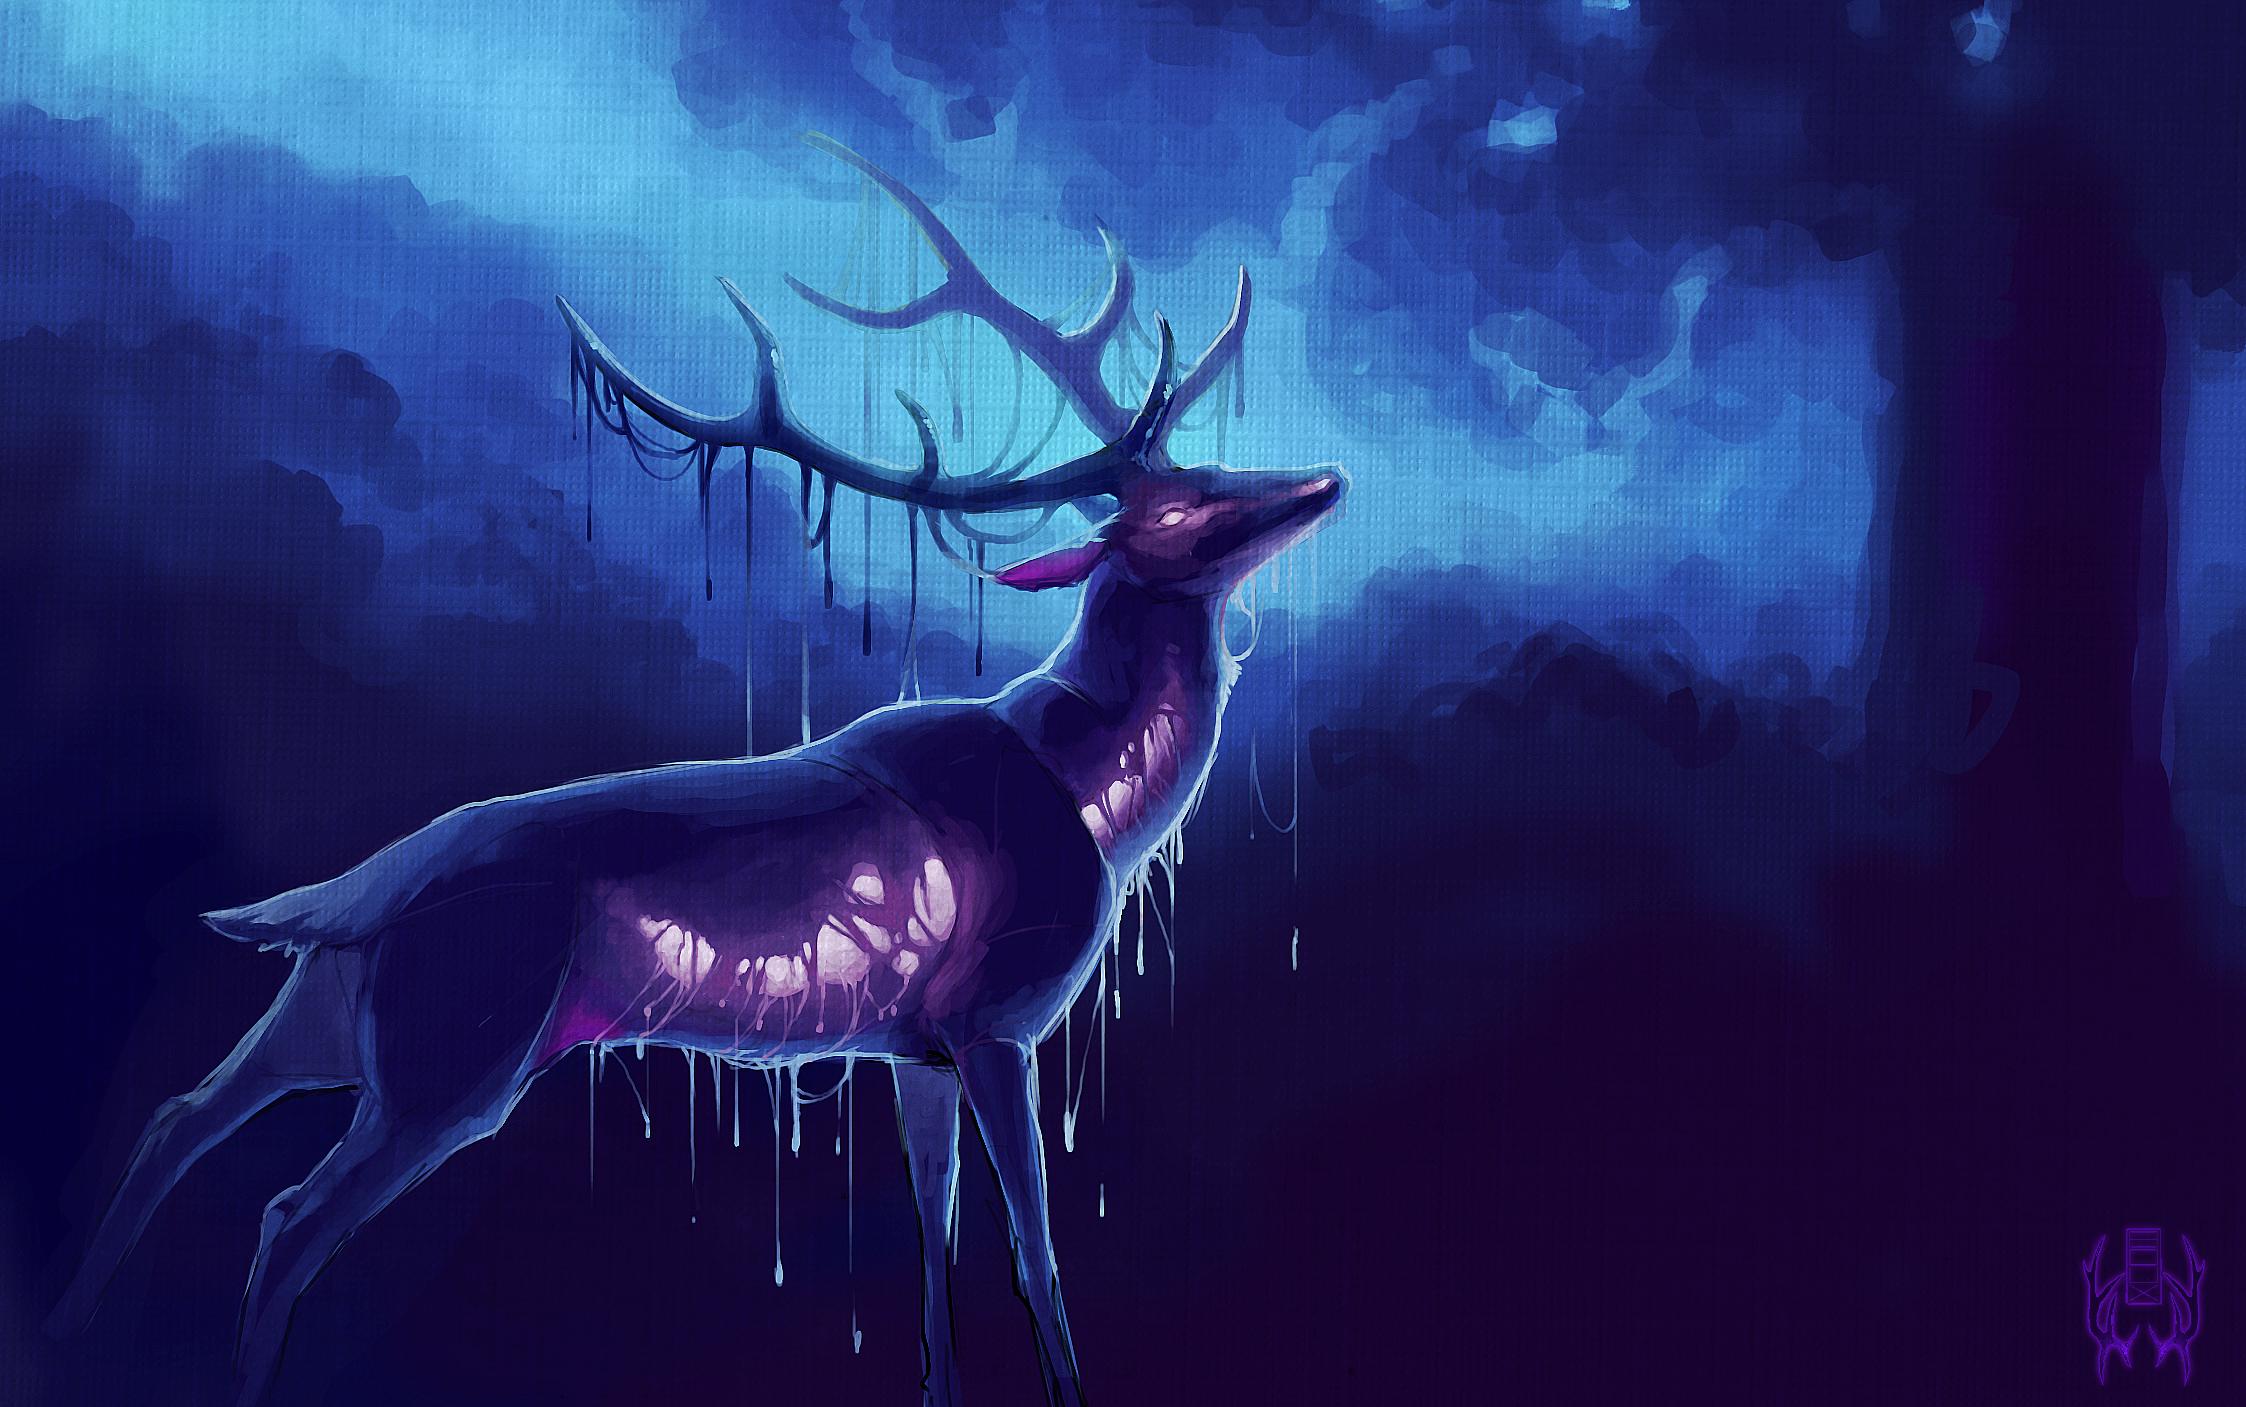 Dead Deer by SorahChan